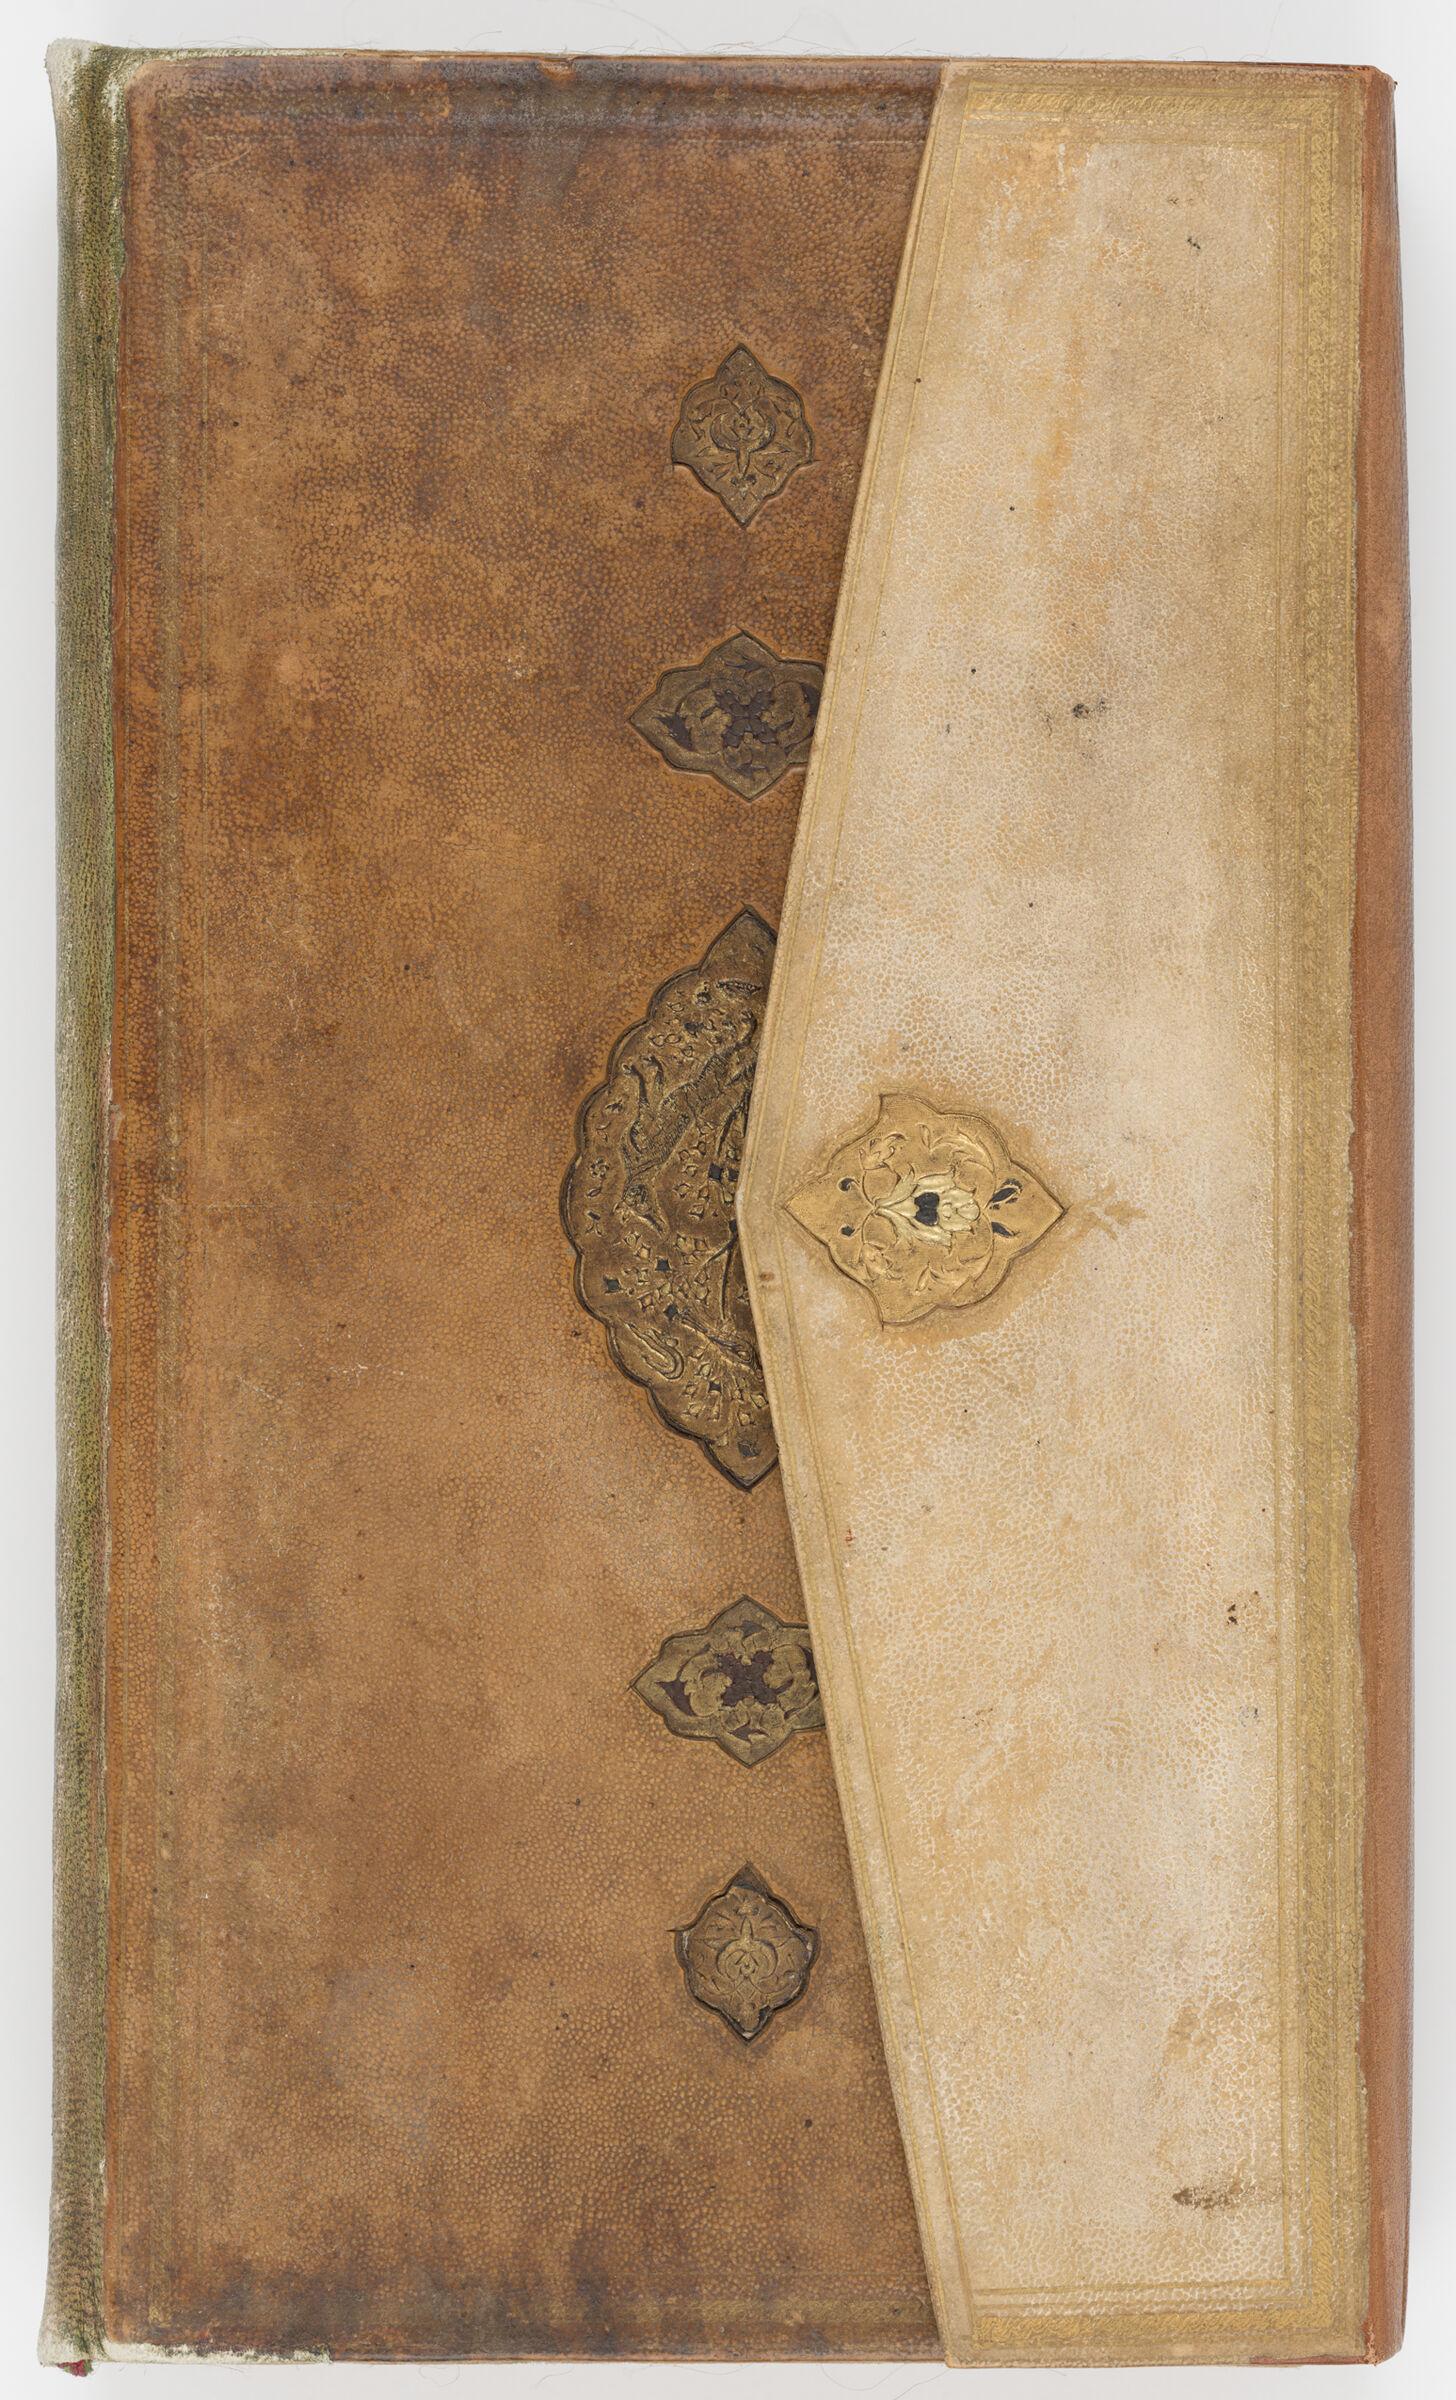 Manuscript Of The Mathnavi-I Ma'navi By Maulana Jalal Al-Din Rumi